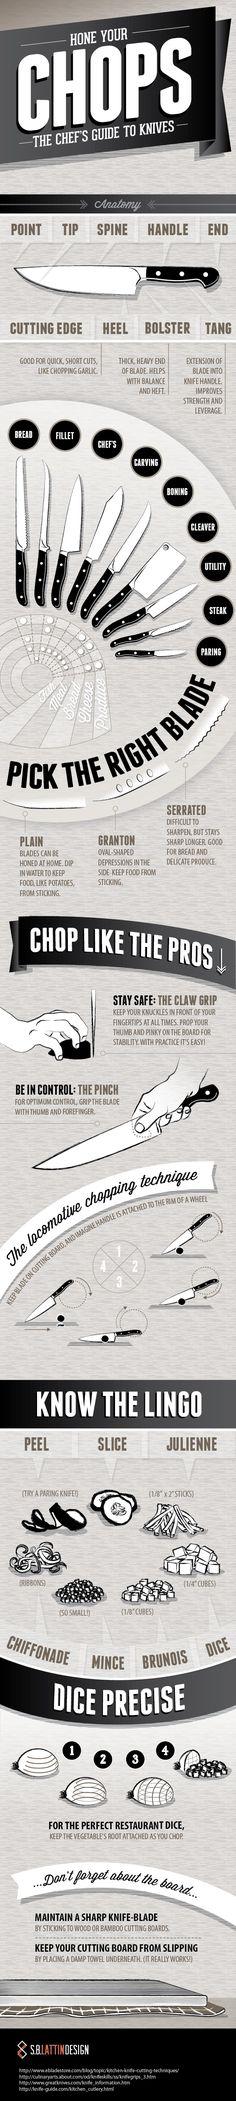 Knife Skills at a Glance